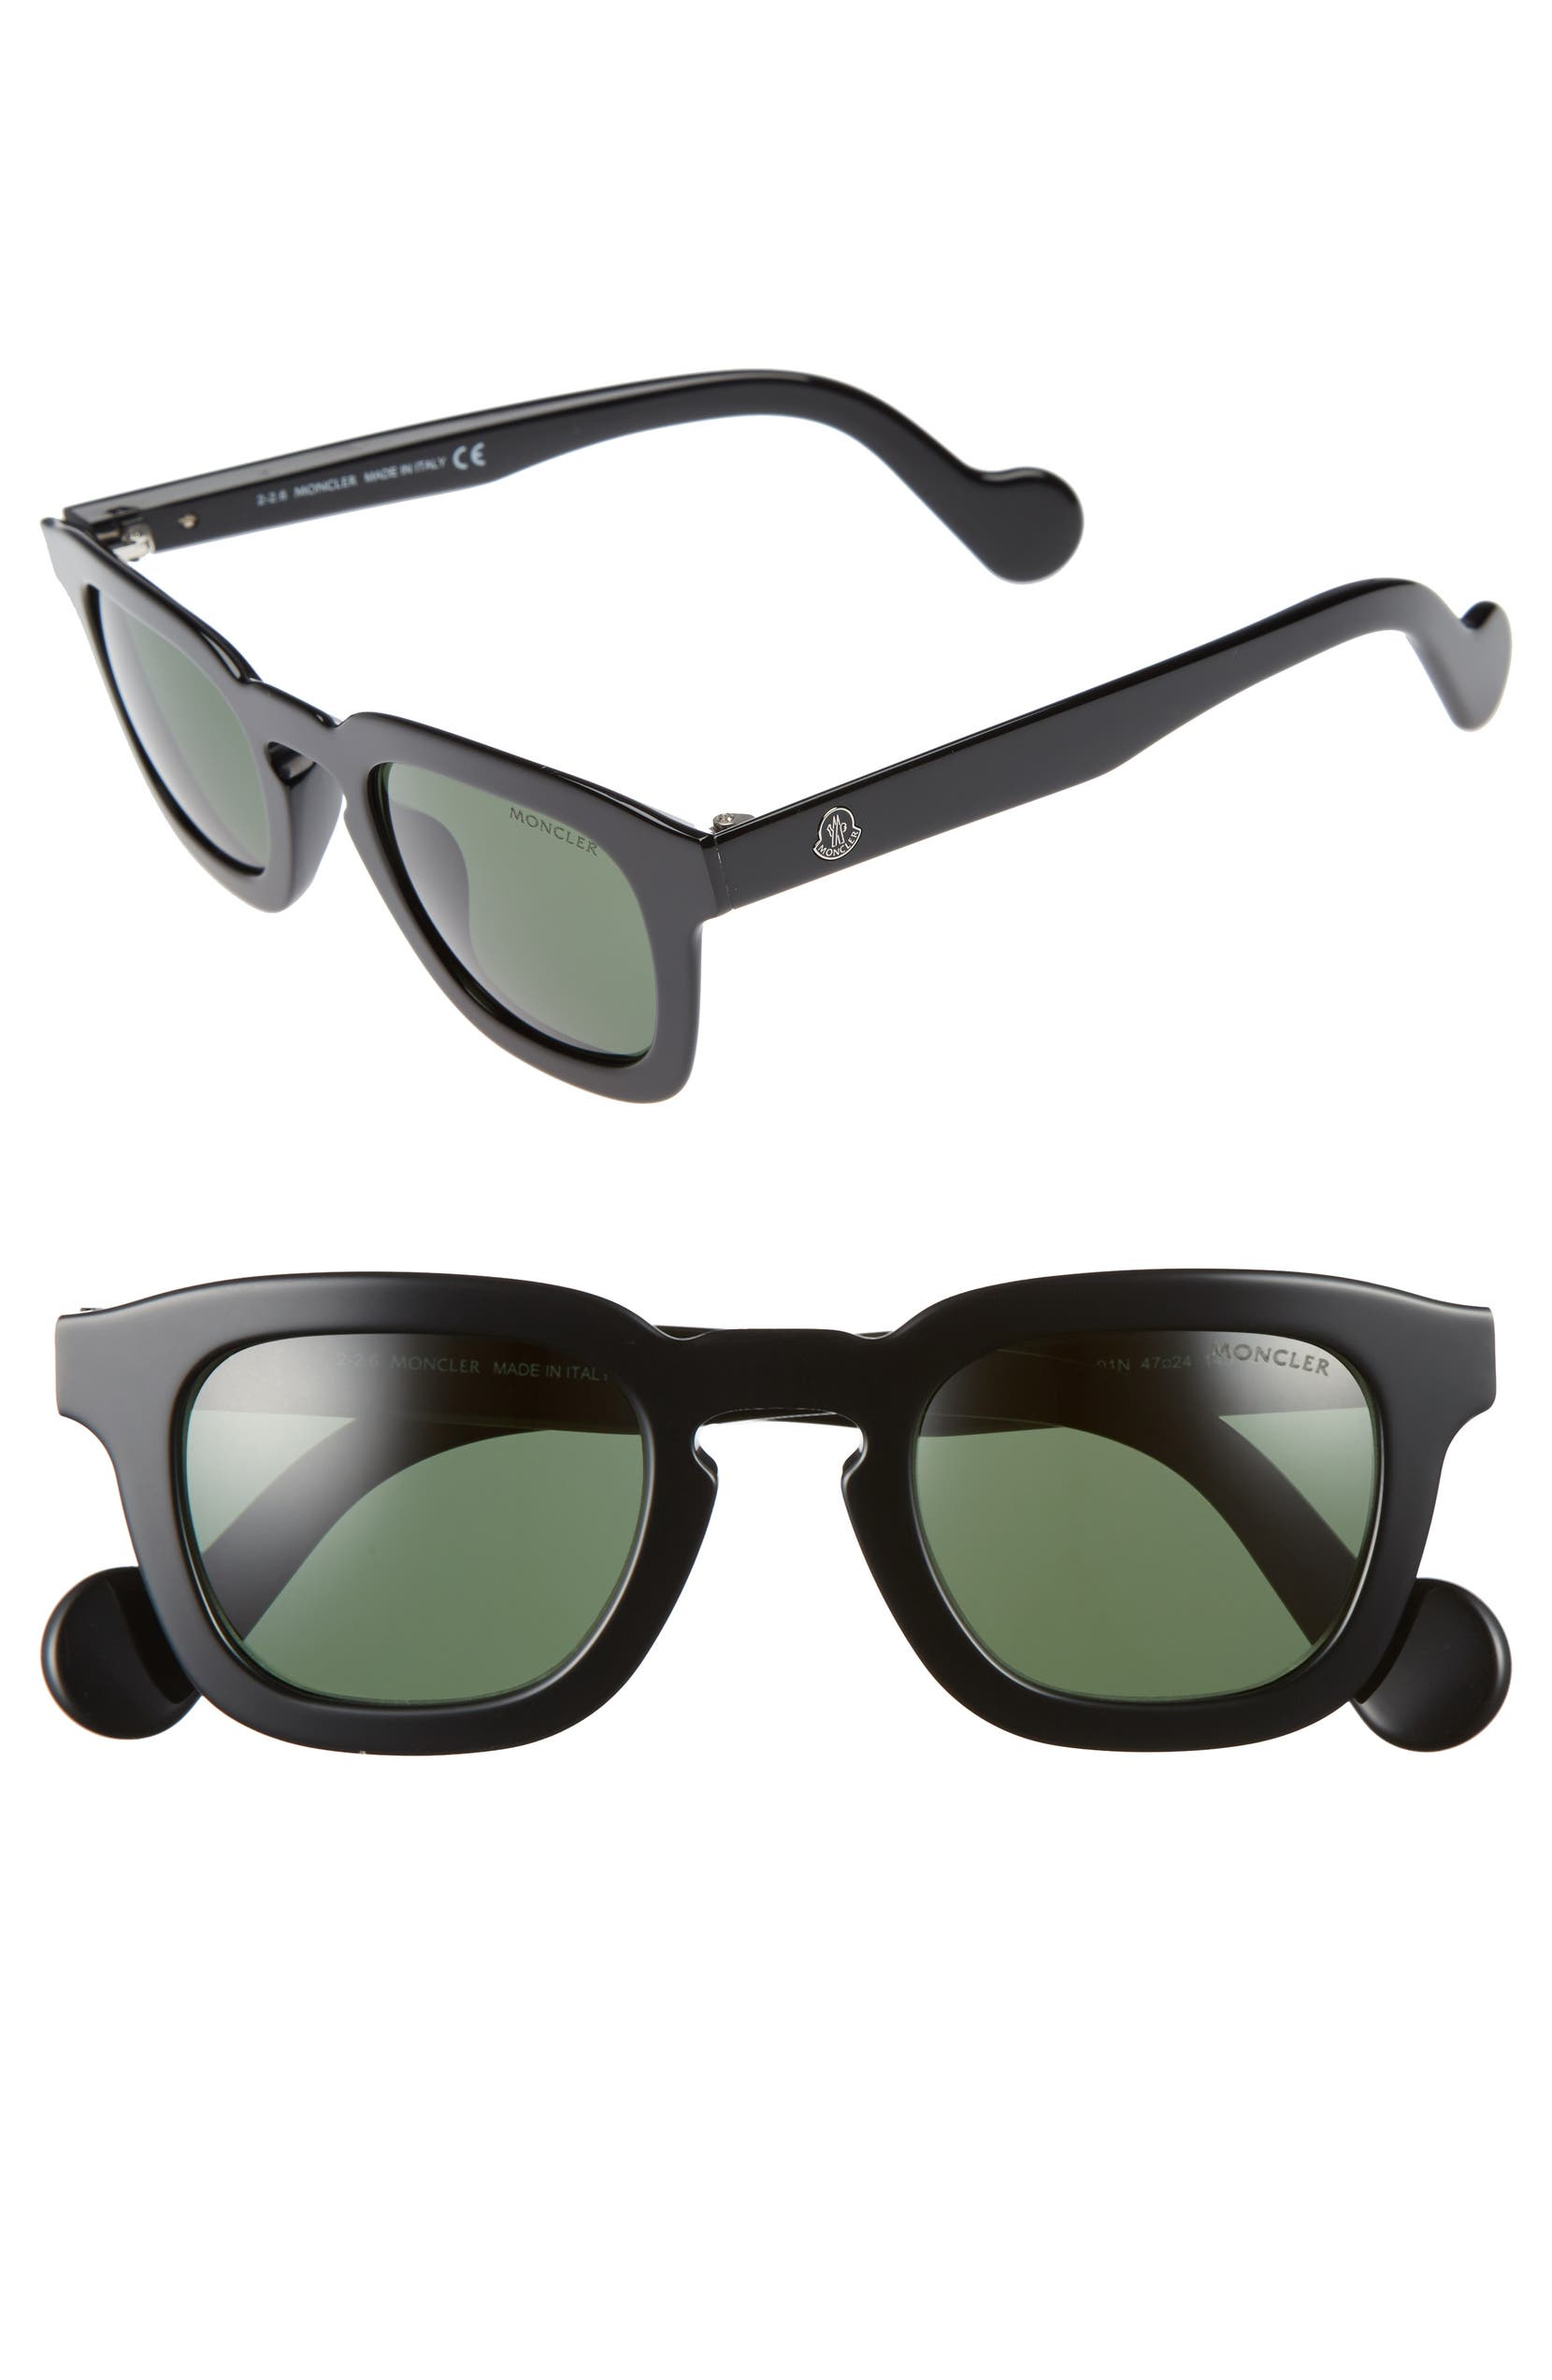 745f40b04d2 Moncler 47mm Sunglasses